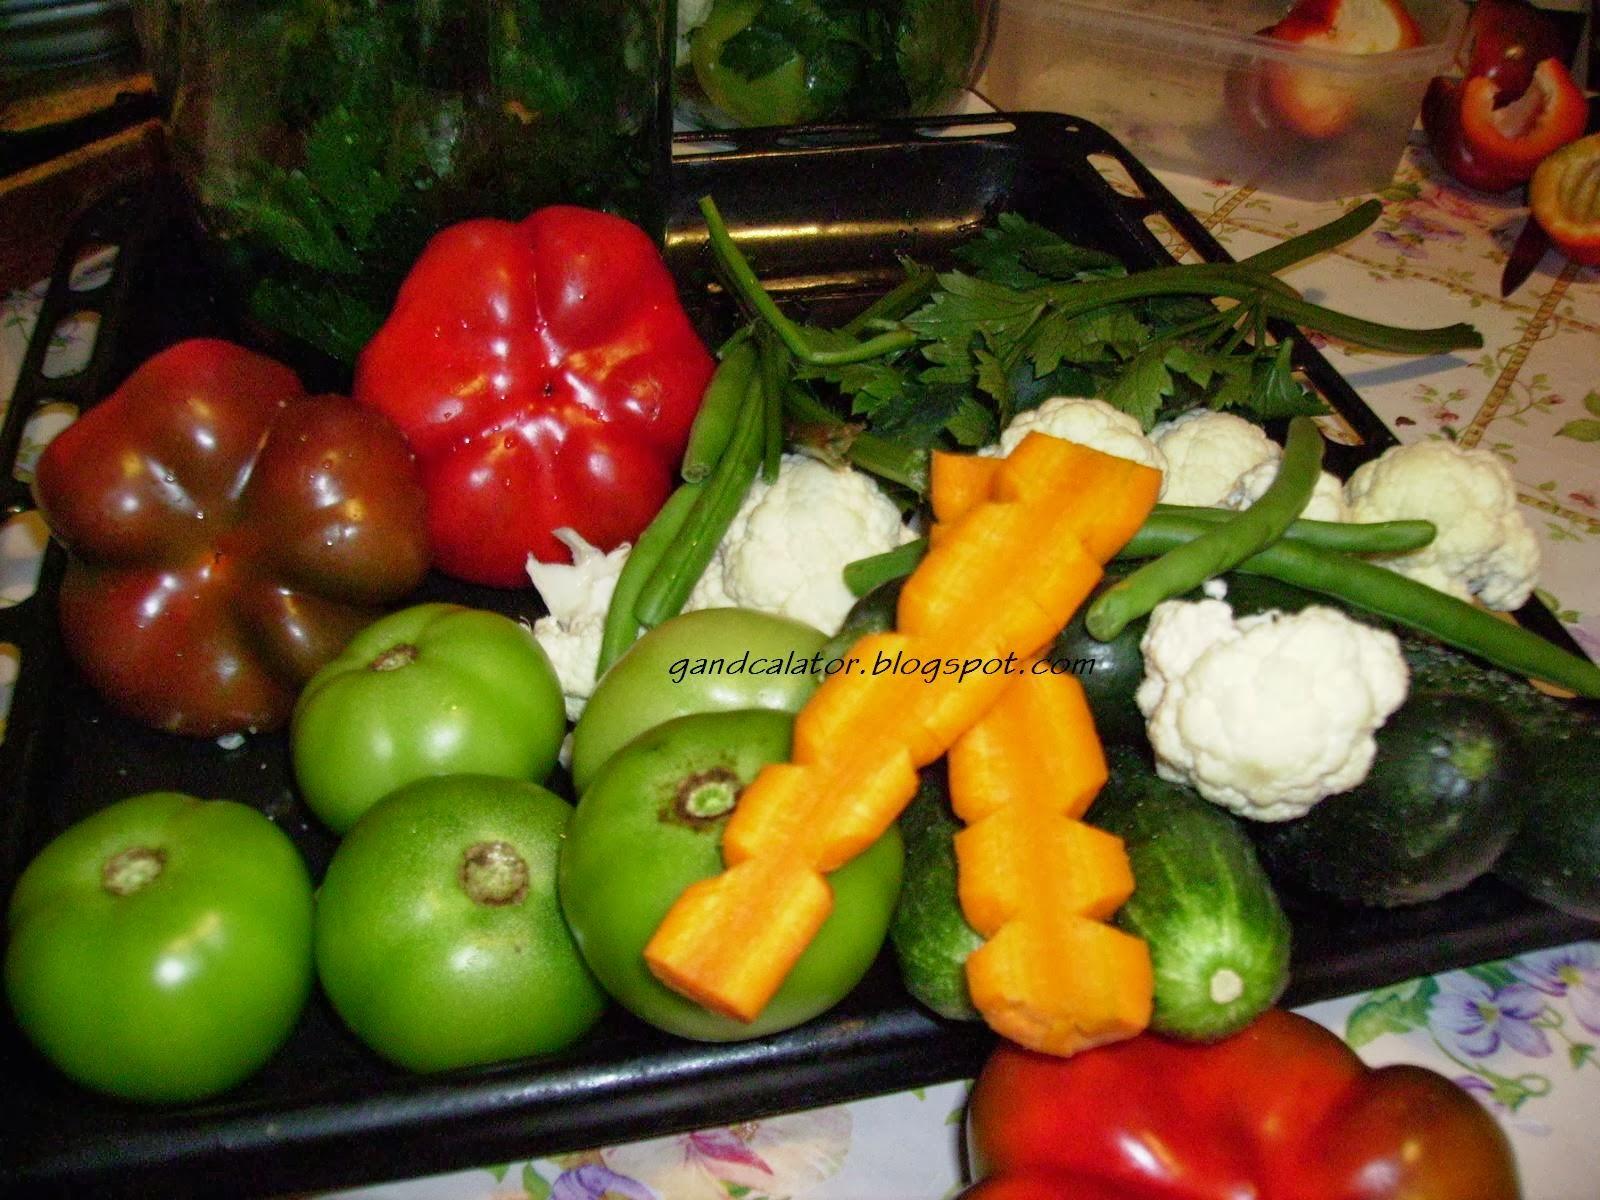 Gogonele/Green tomatoes